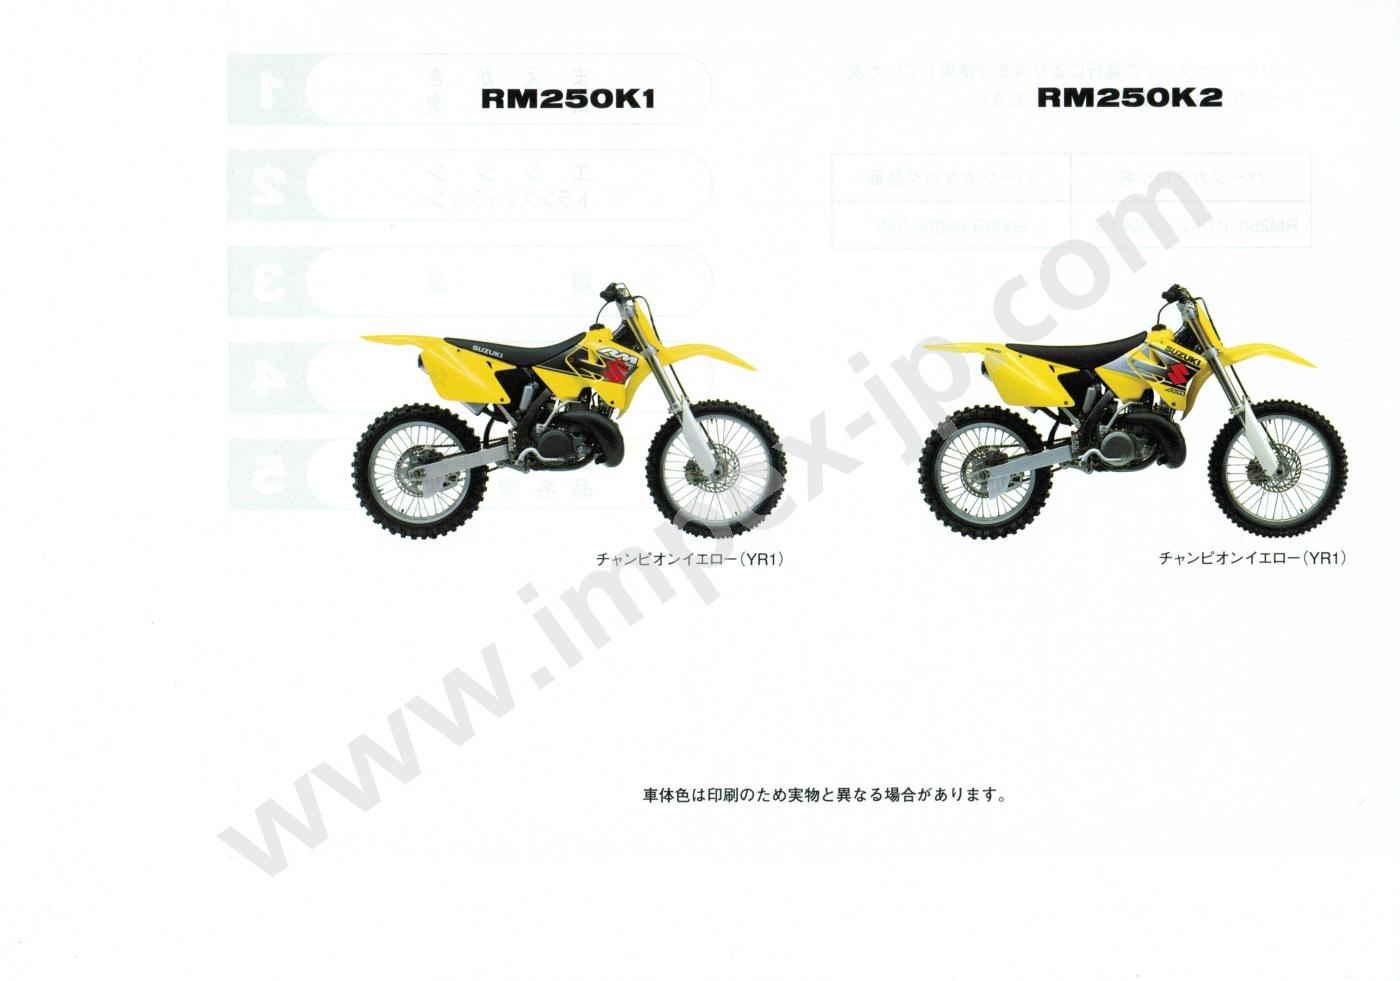 Motorcycle Parts Suzuki Rm250 Rj18a Impex Japan Rm 250 Engine Diagram